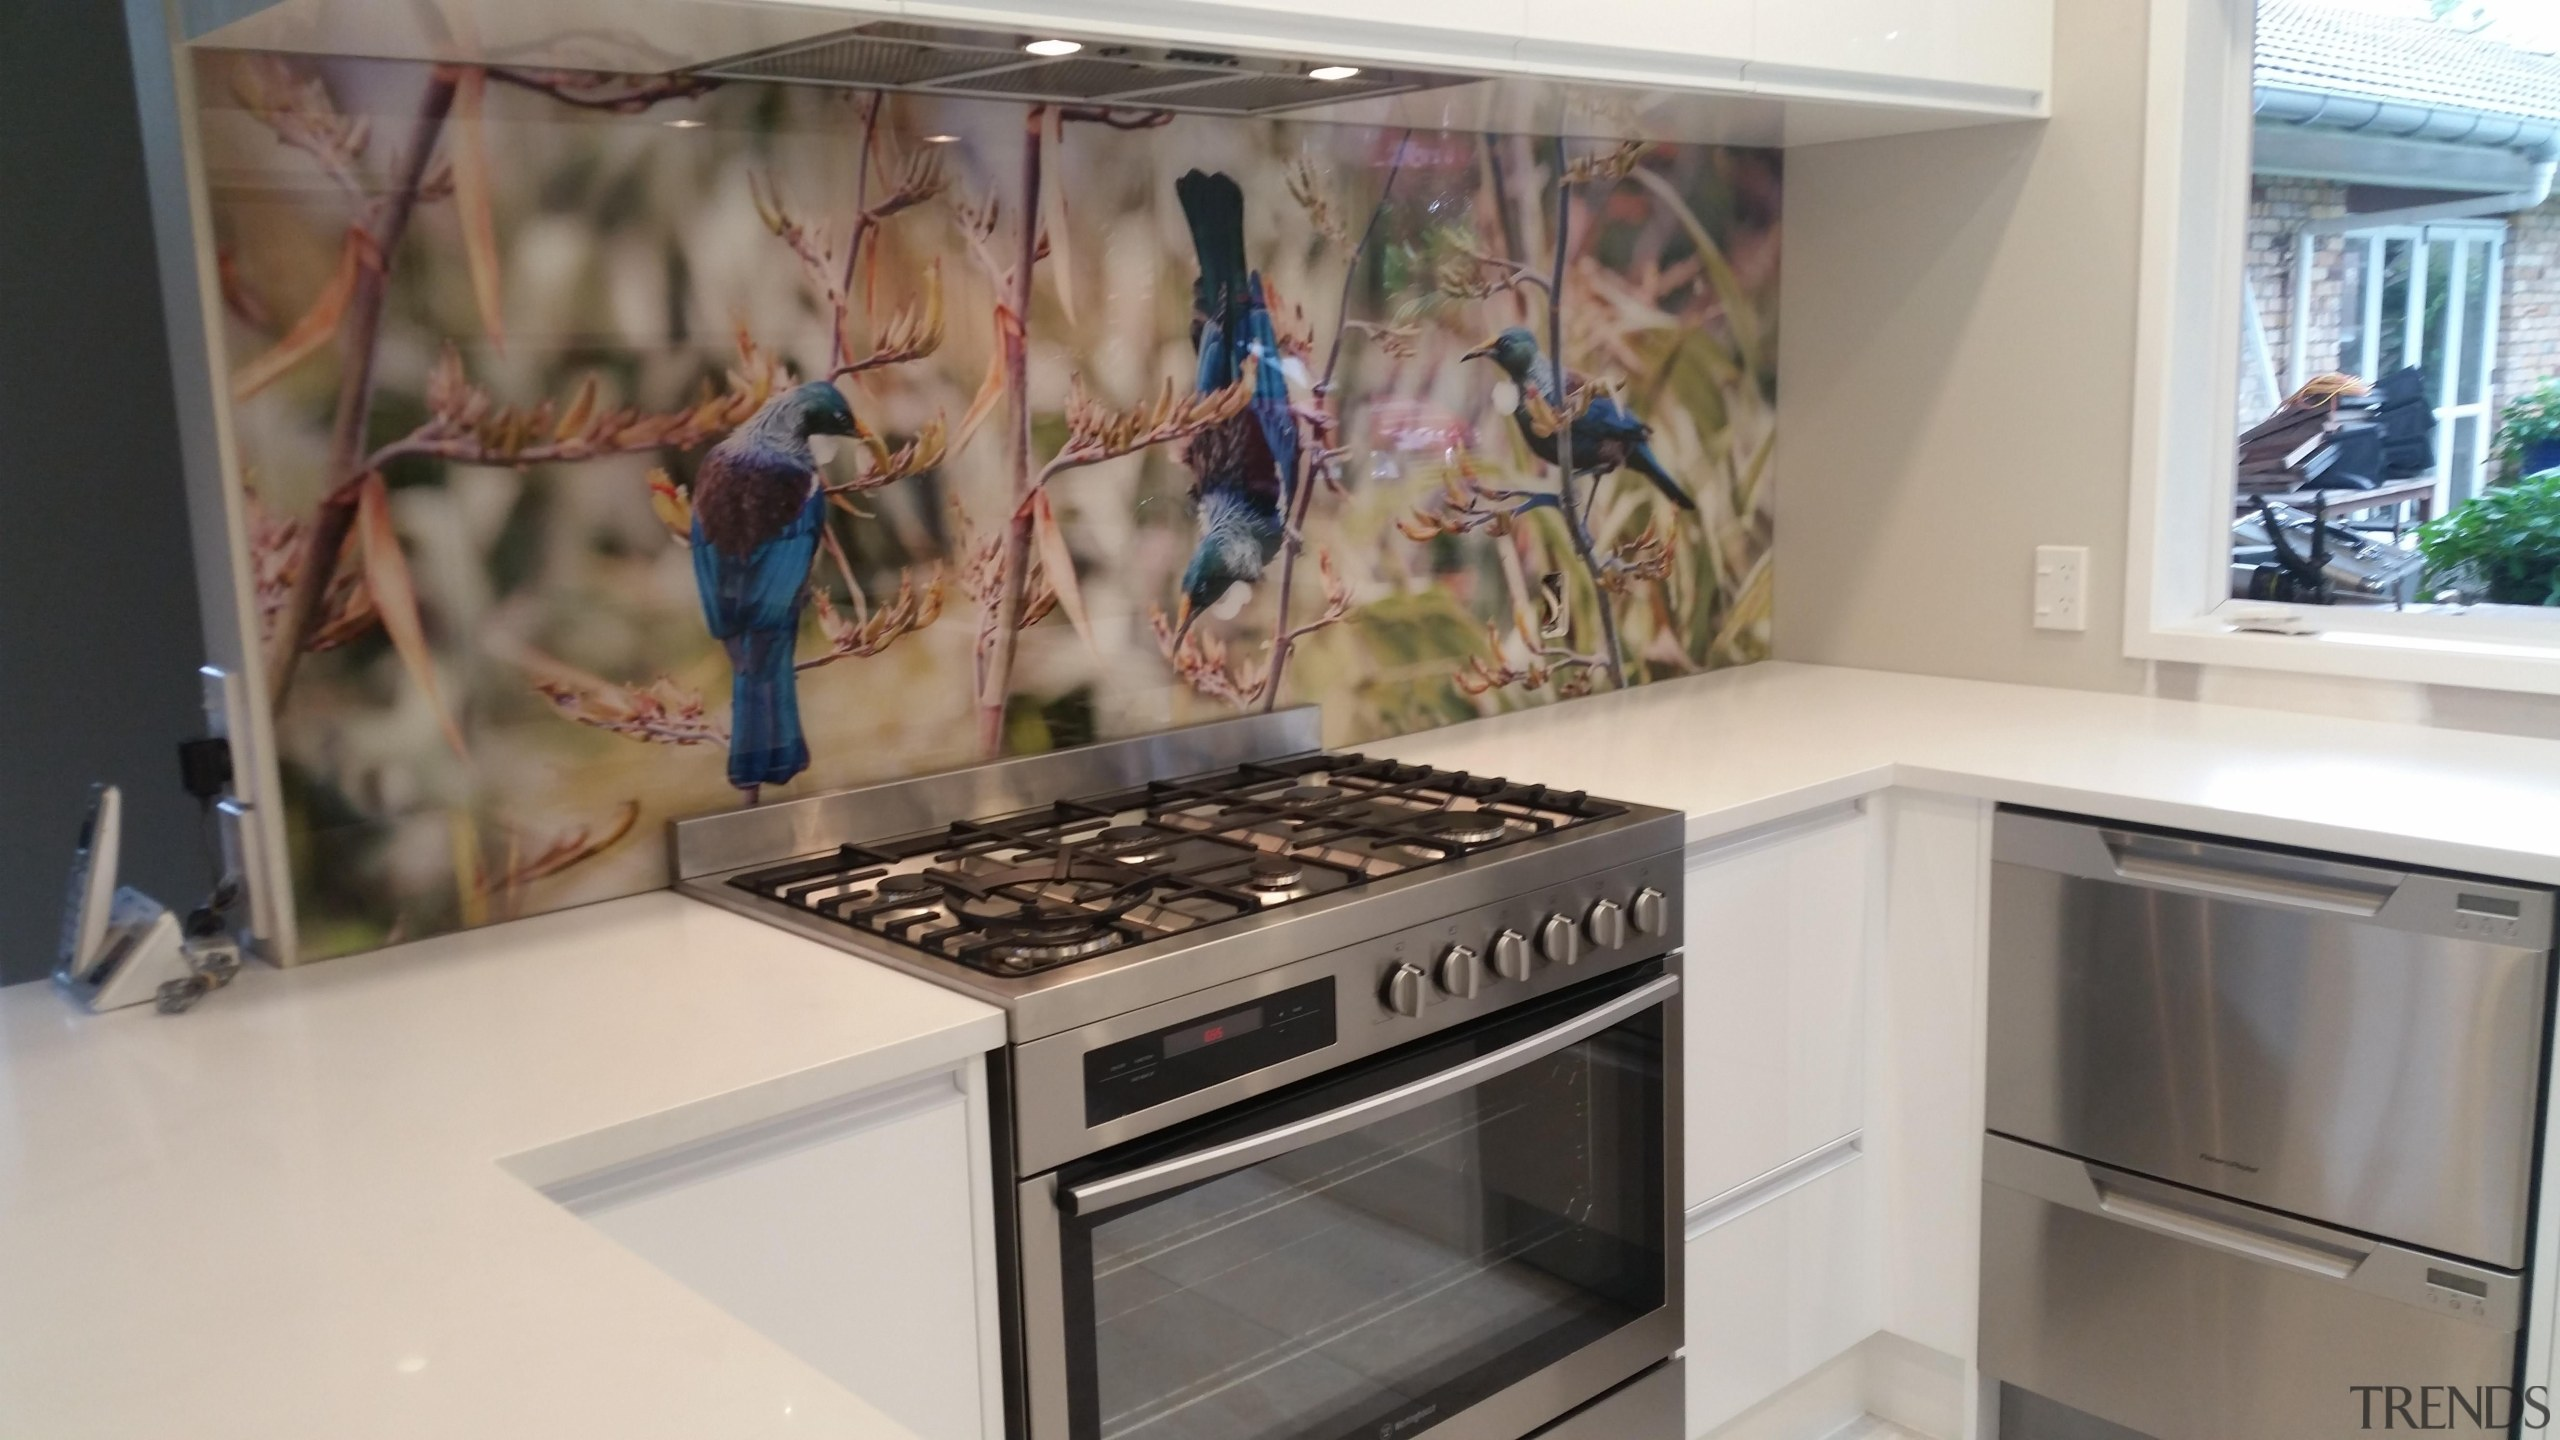 20141218094739.jpg - 20141218094739.jpg - countertop | home appliance countertop, home appliance, kitchen, room, gray